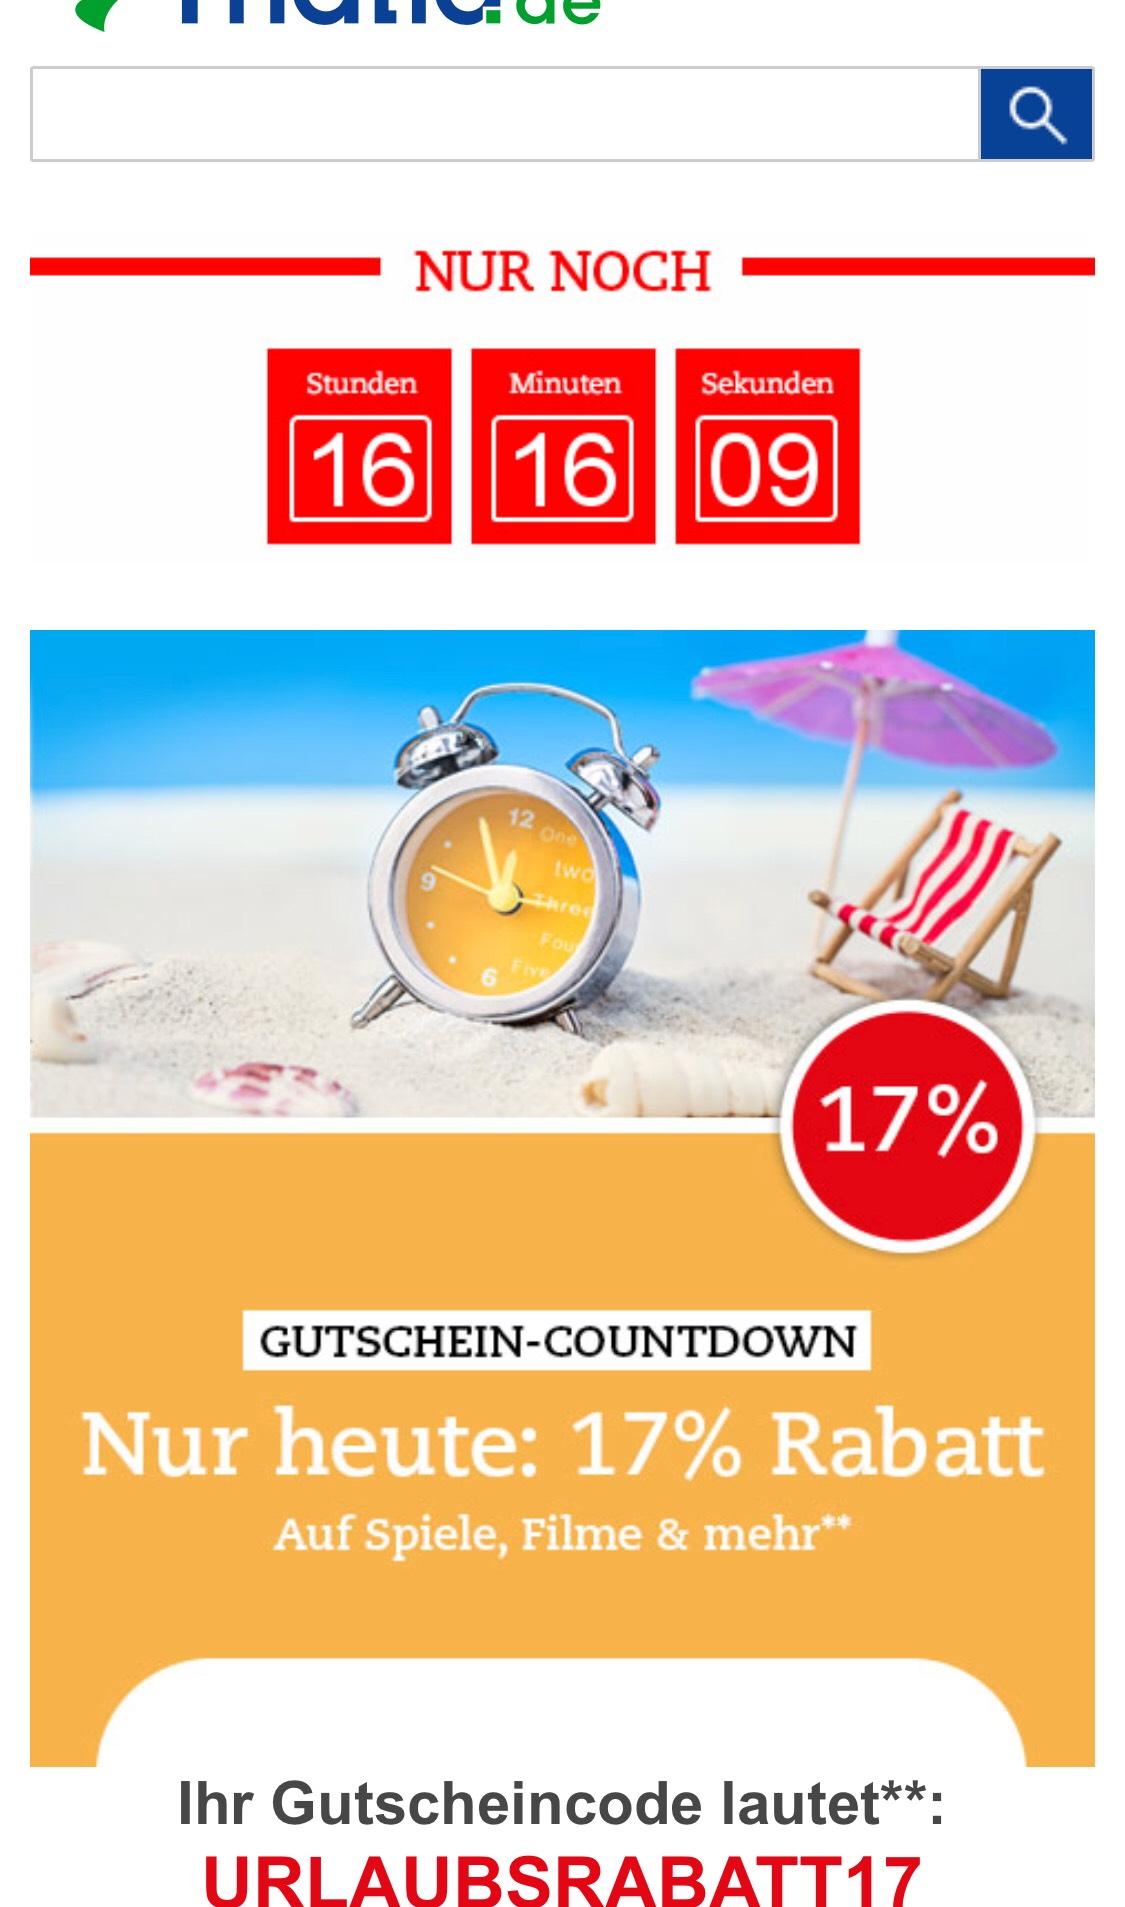 17% Rabatt bei Thalia.de auf Spiele, Filme etc.